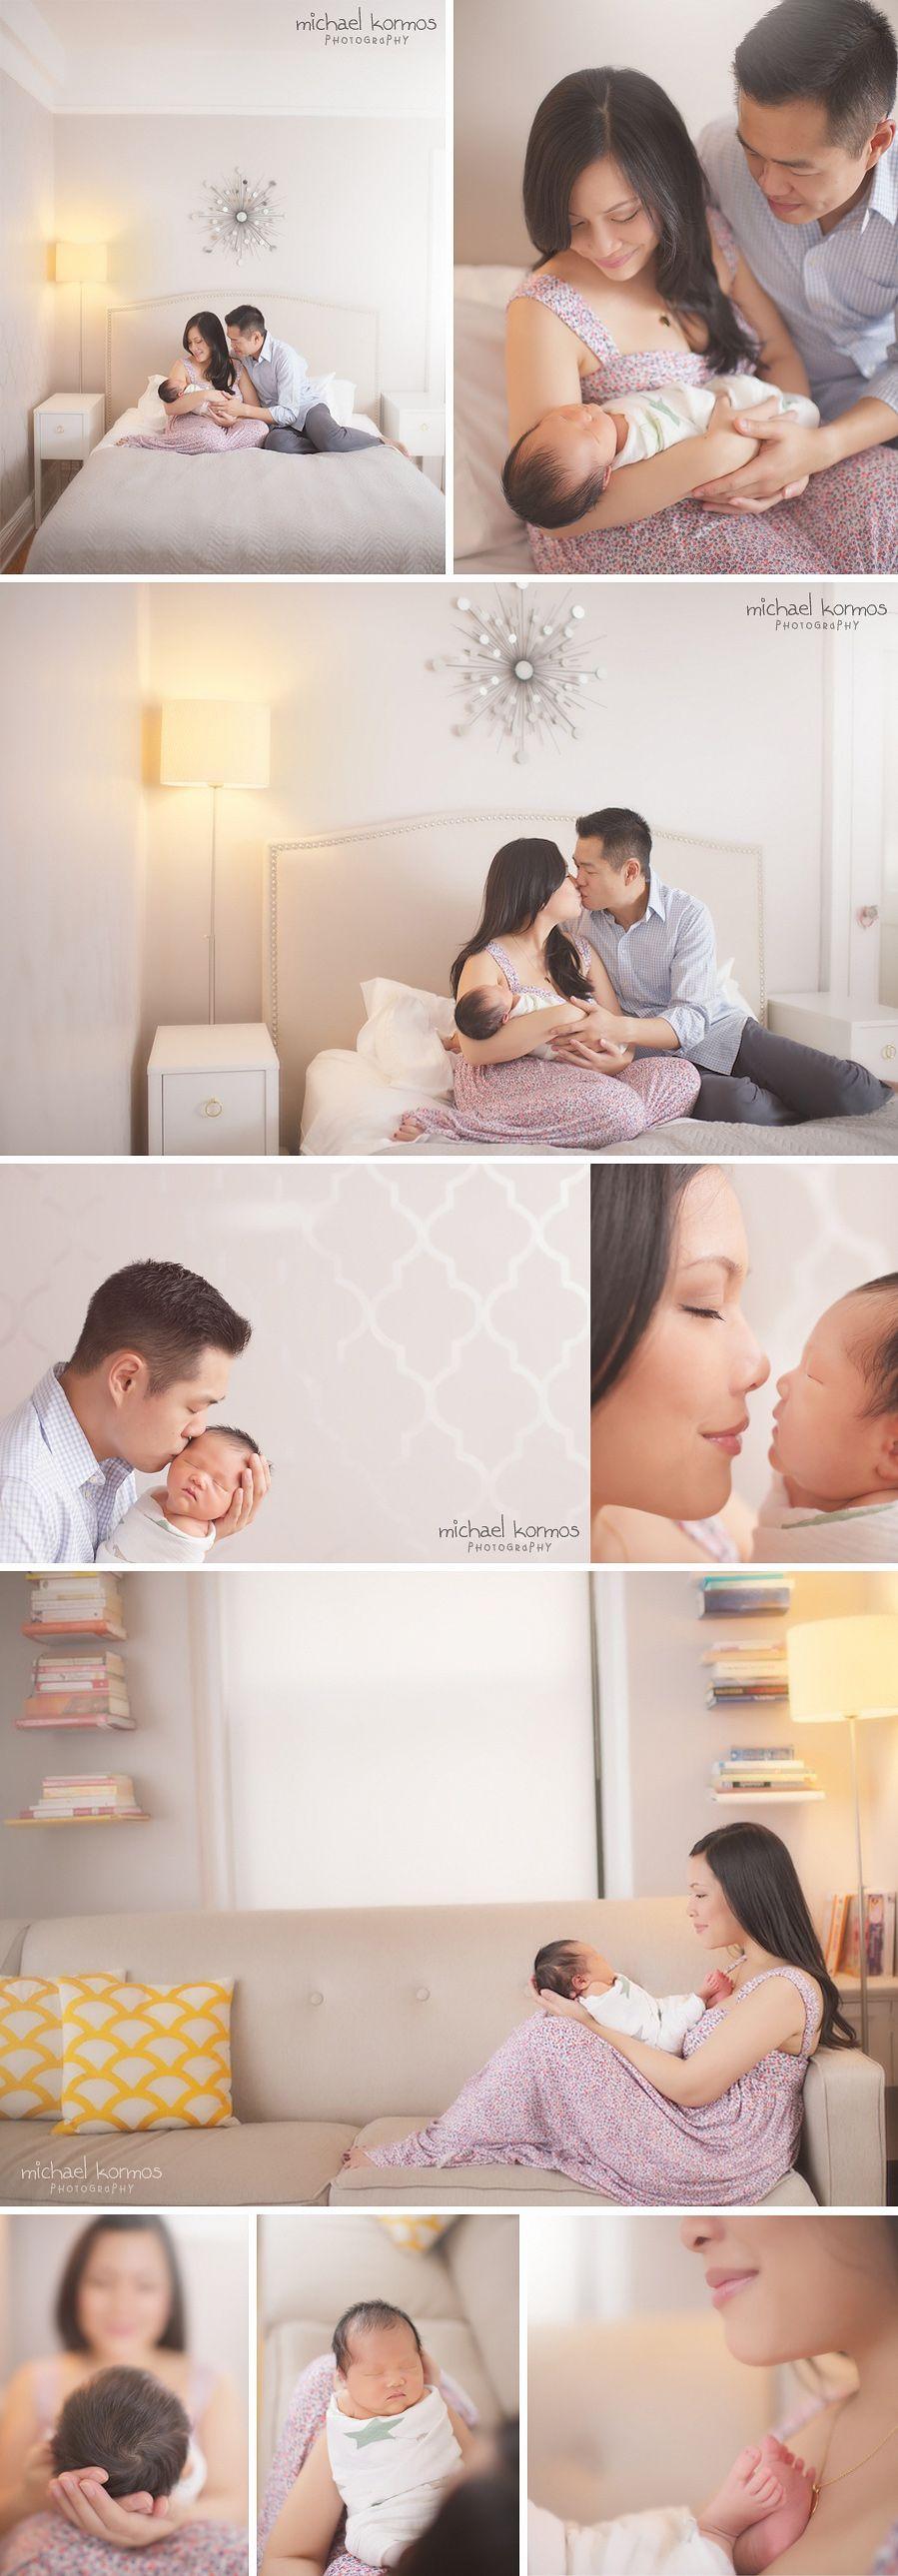 head over heels(newborn photography, newborn photographer nyc) » Family Photography – NYC Photographer Michael Kormos | BLOG.